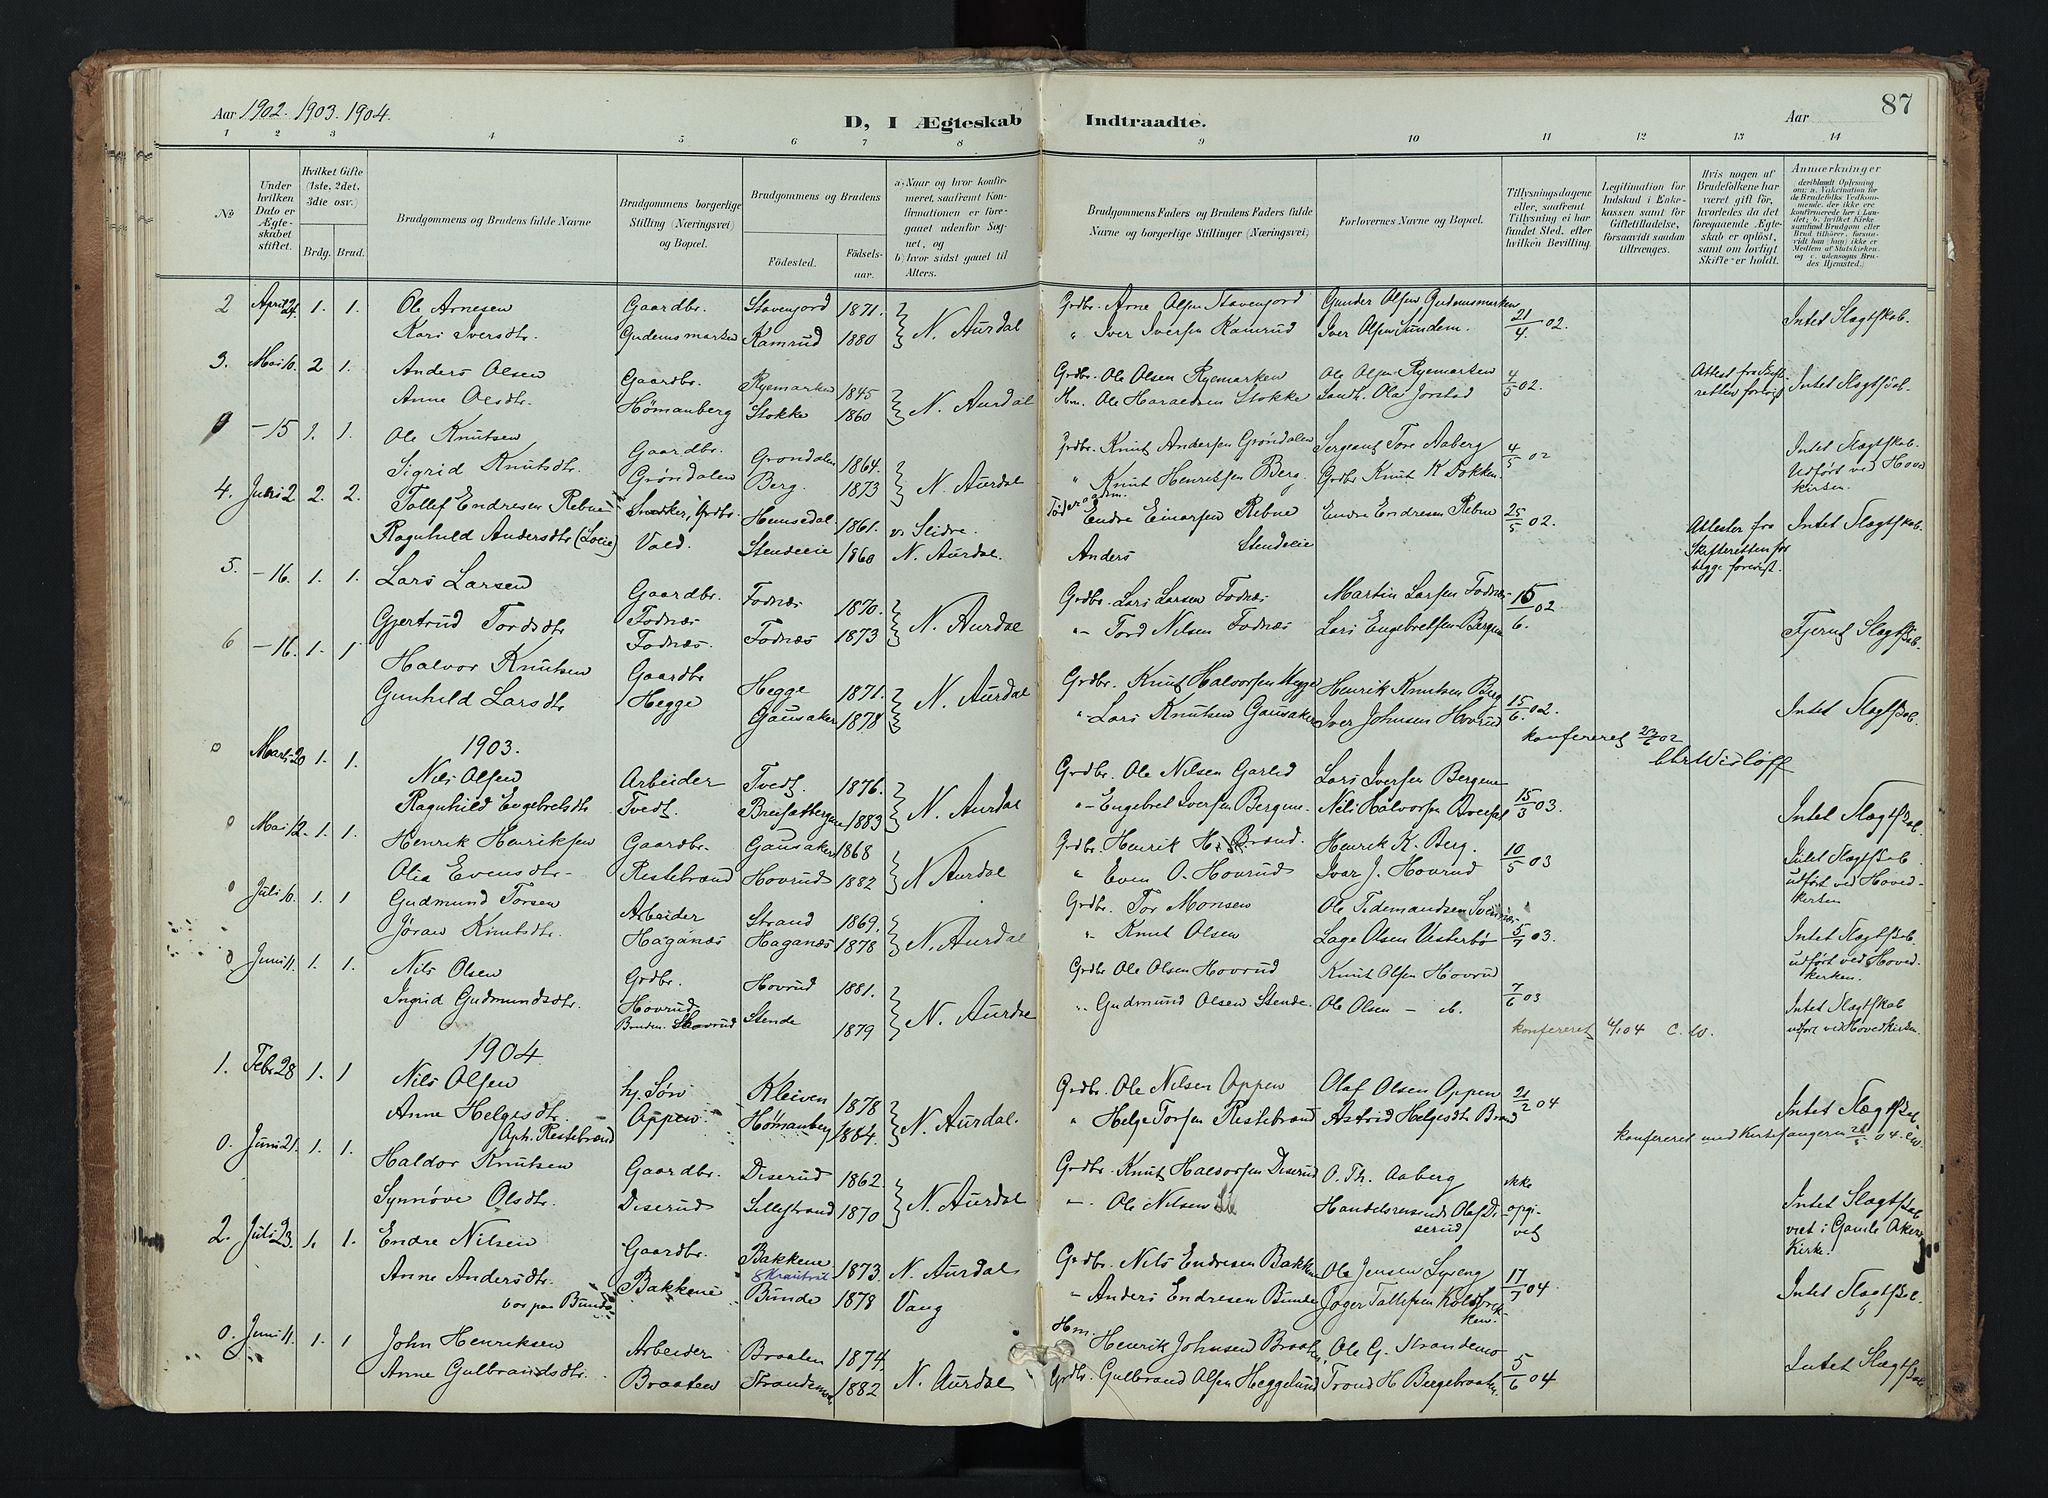 SAH, Nord-Aurdal prestekontor, Ministerialbok nr. 16, 1897-1925, s. 87